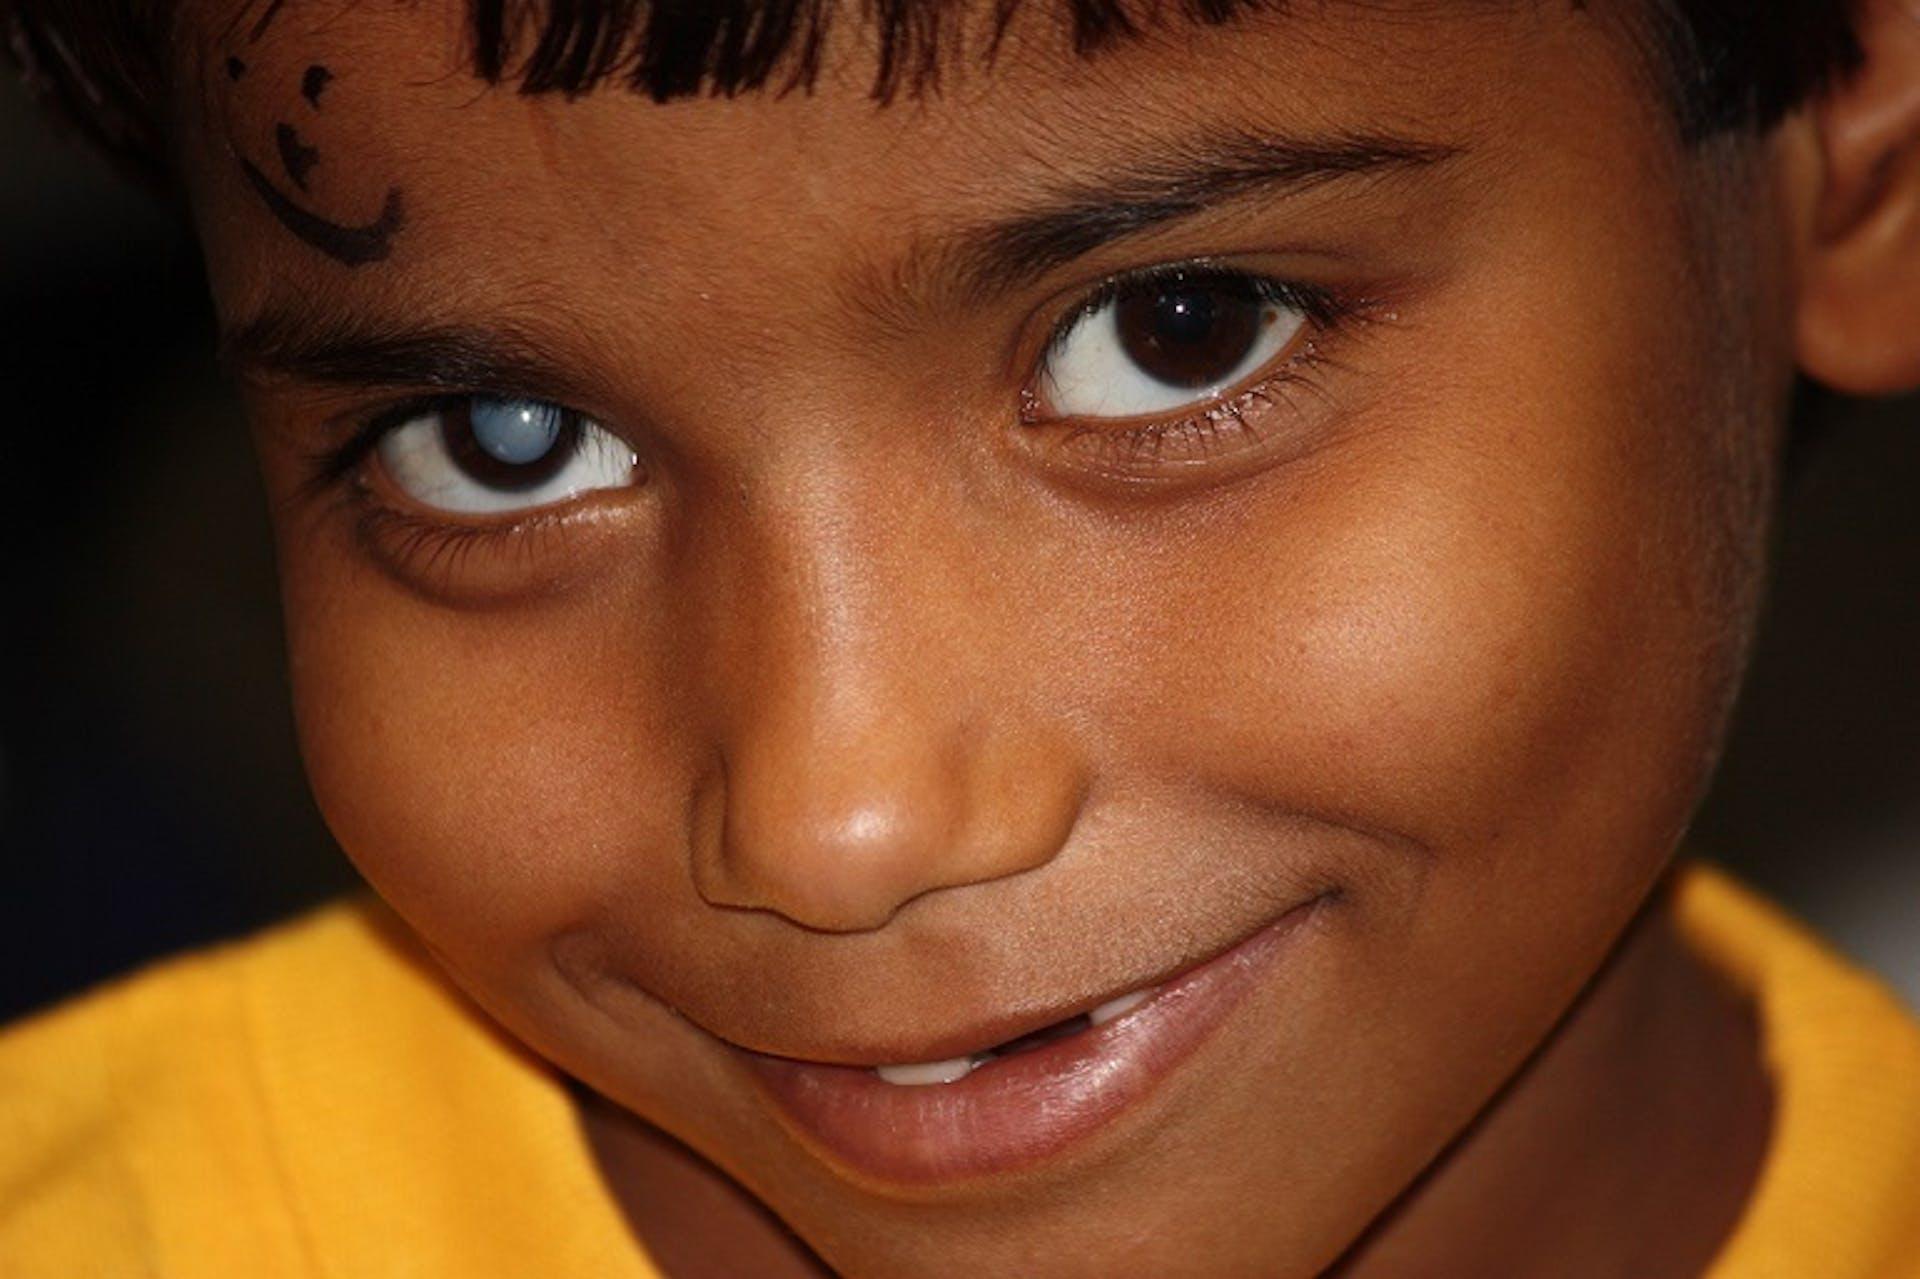 Renu Kumari, an Indian child with right traumatic cataract, wearing a yellow top, looks into camera